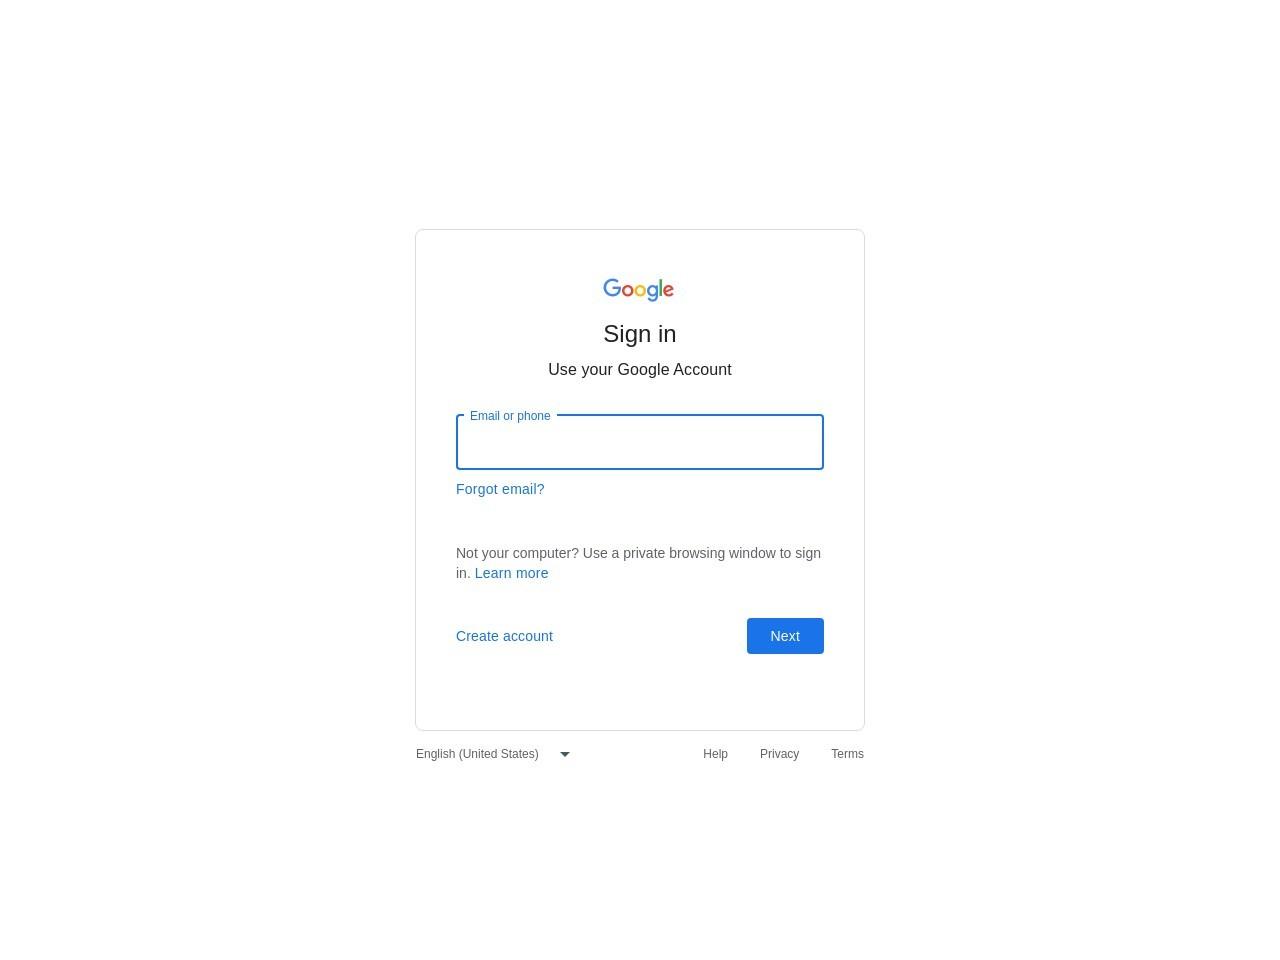 Google Web Page Login